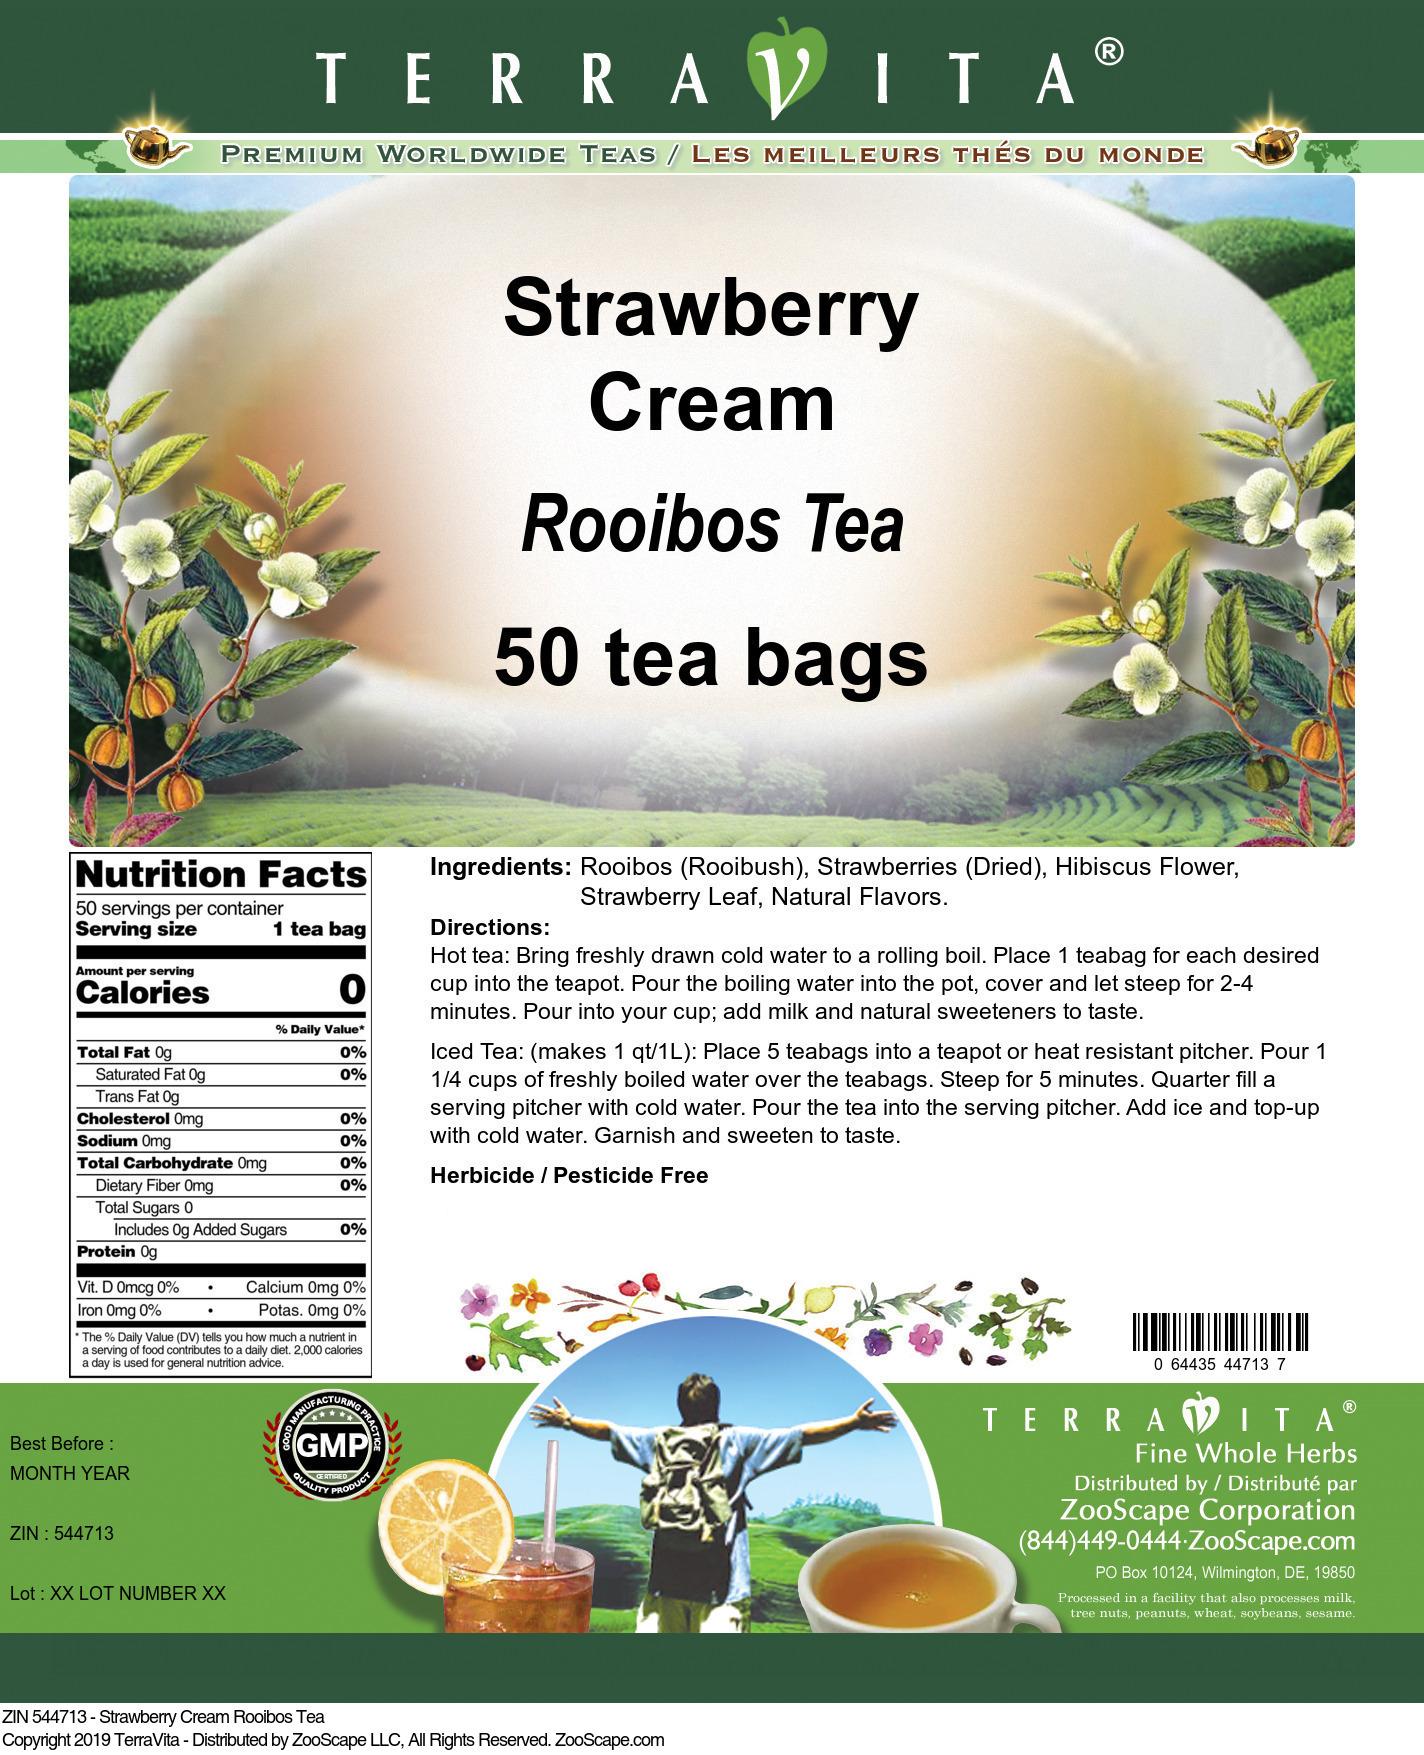 Strawberry Cream Rooibos Tea